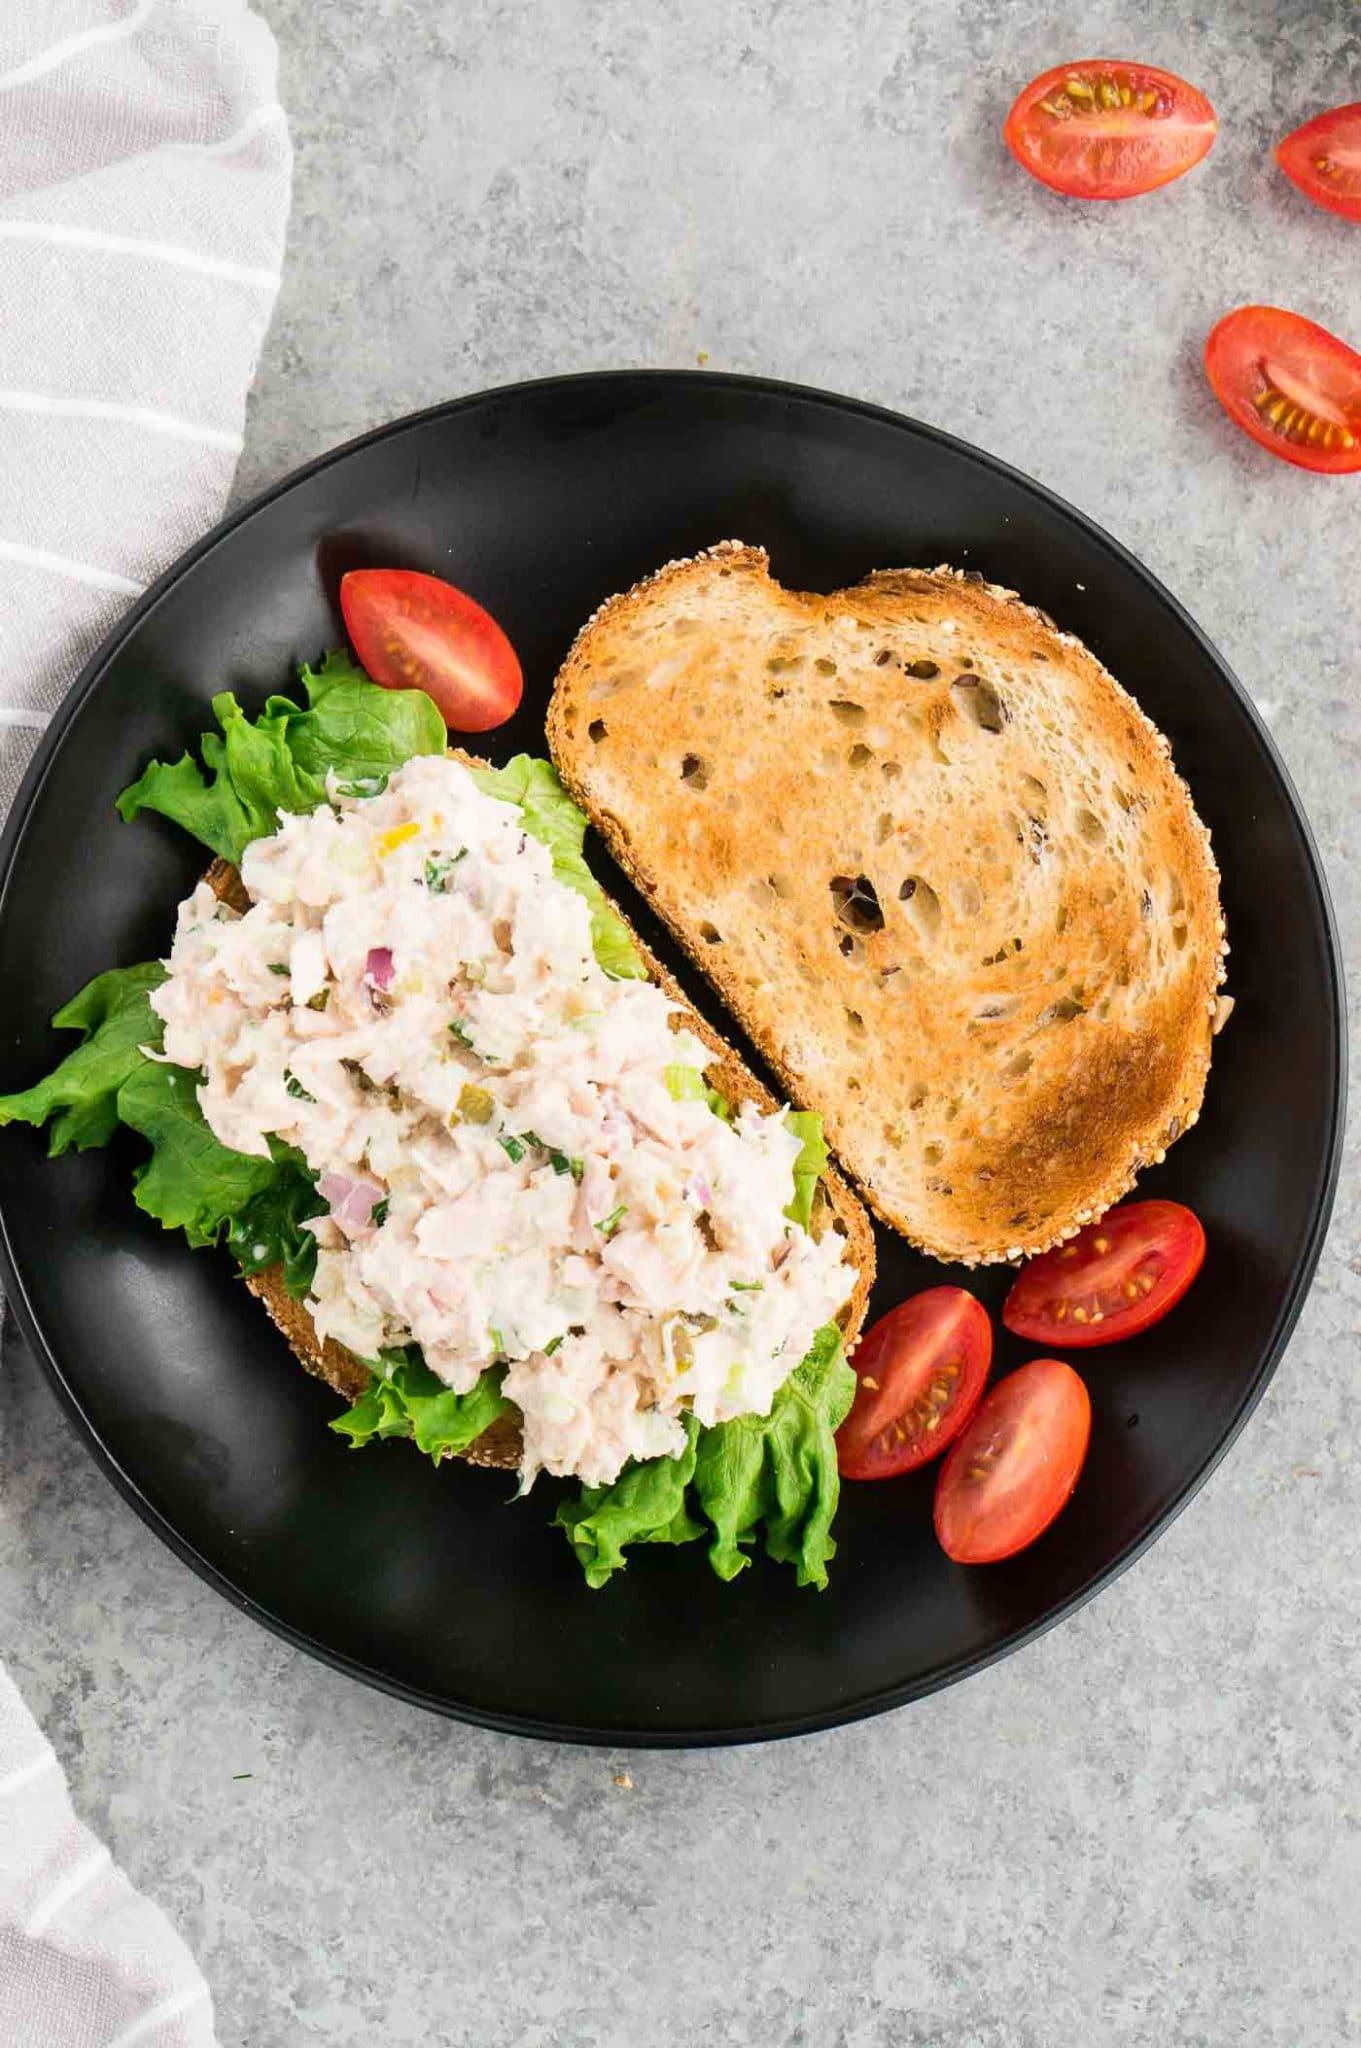 open face sandwich with tuna spread